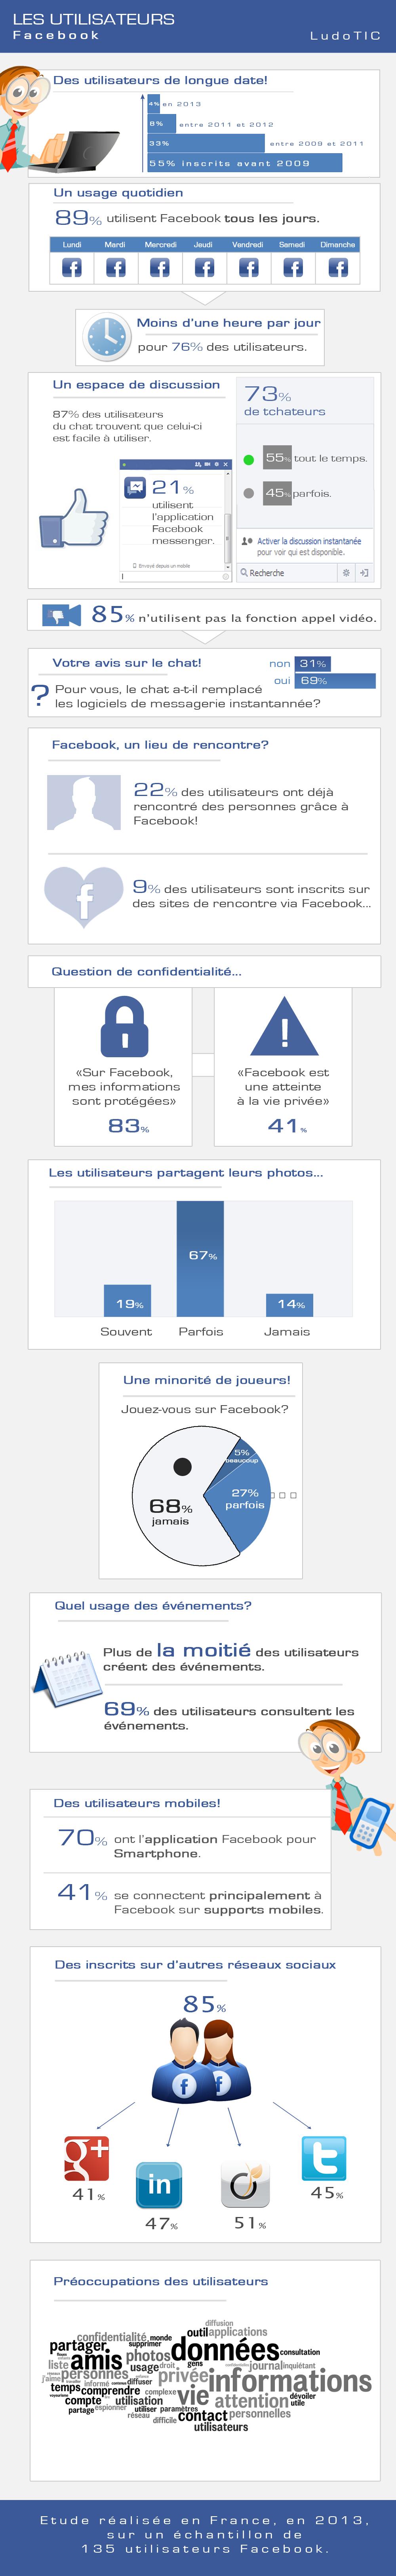 Infographie usages Facebook